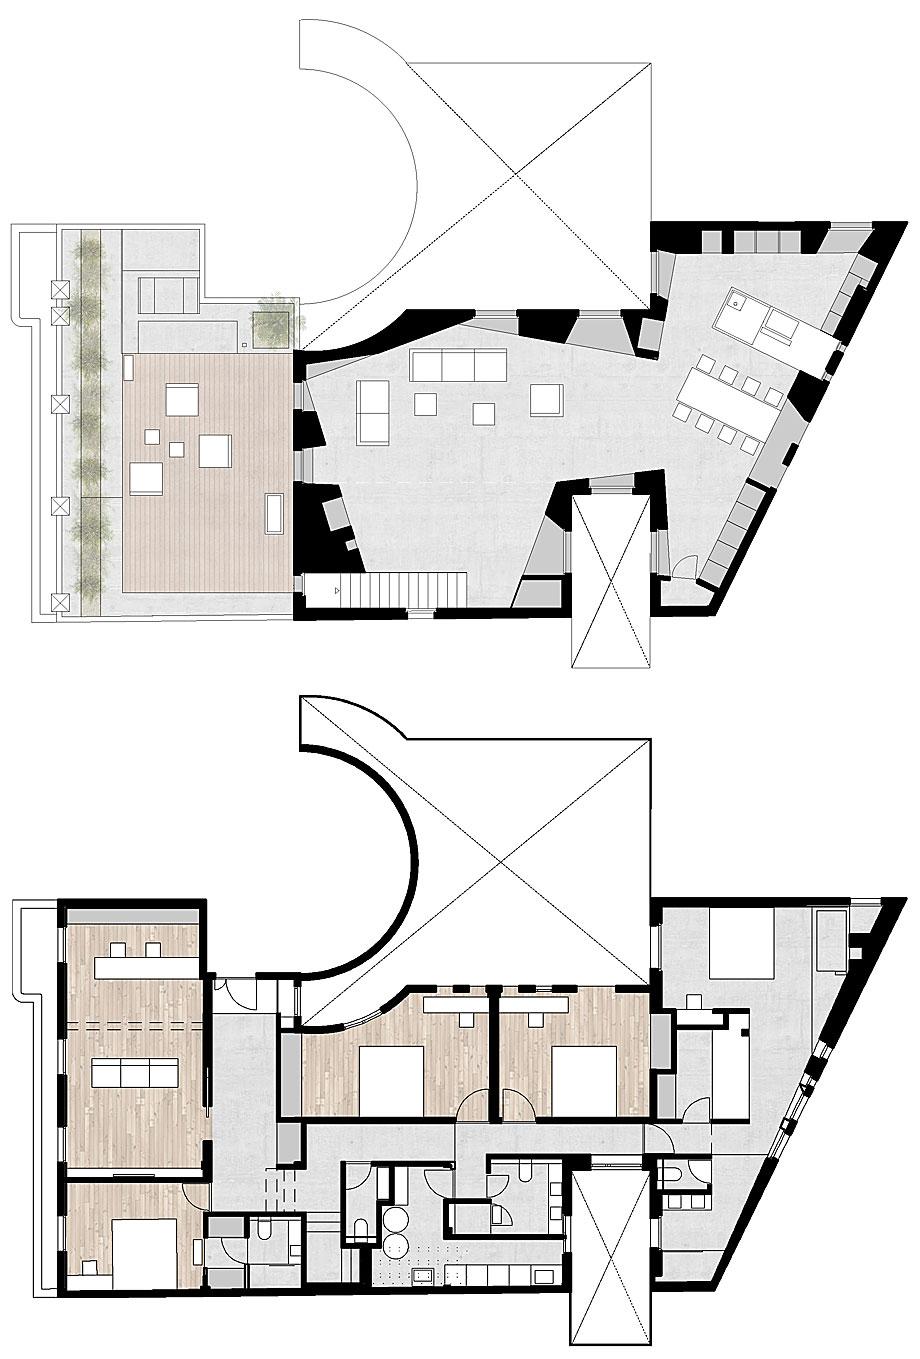 reforma-alcala-wespi-de-meuron-romeo-architects-abaton (23)